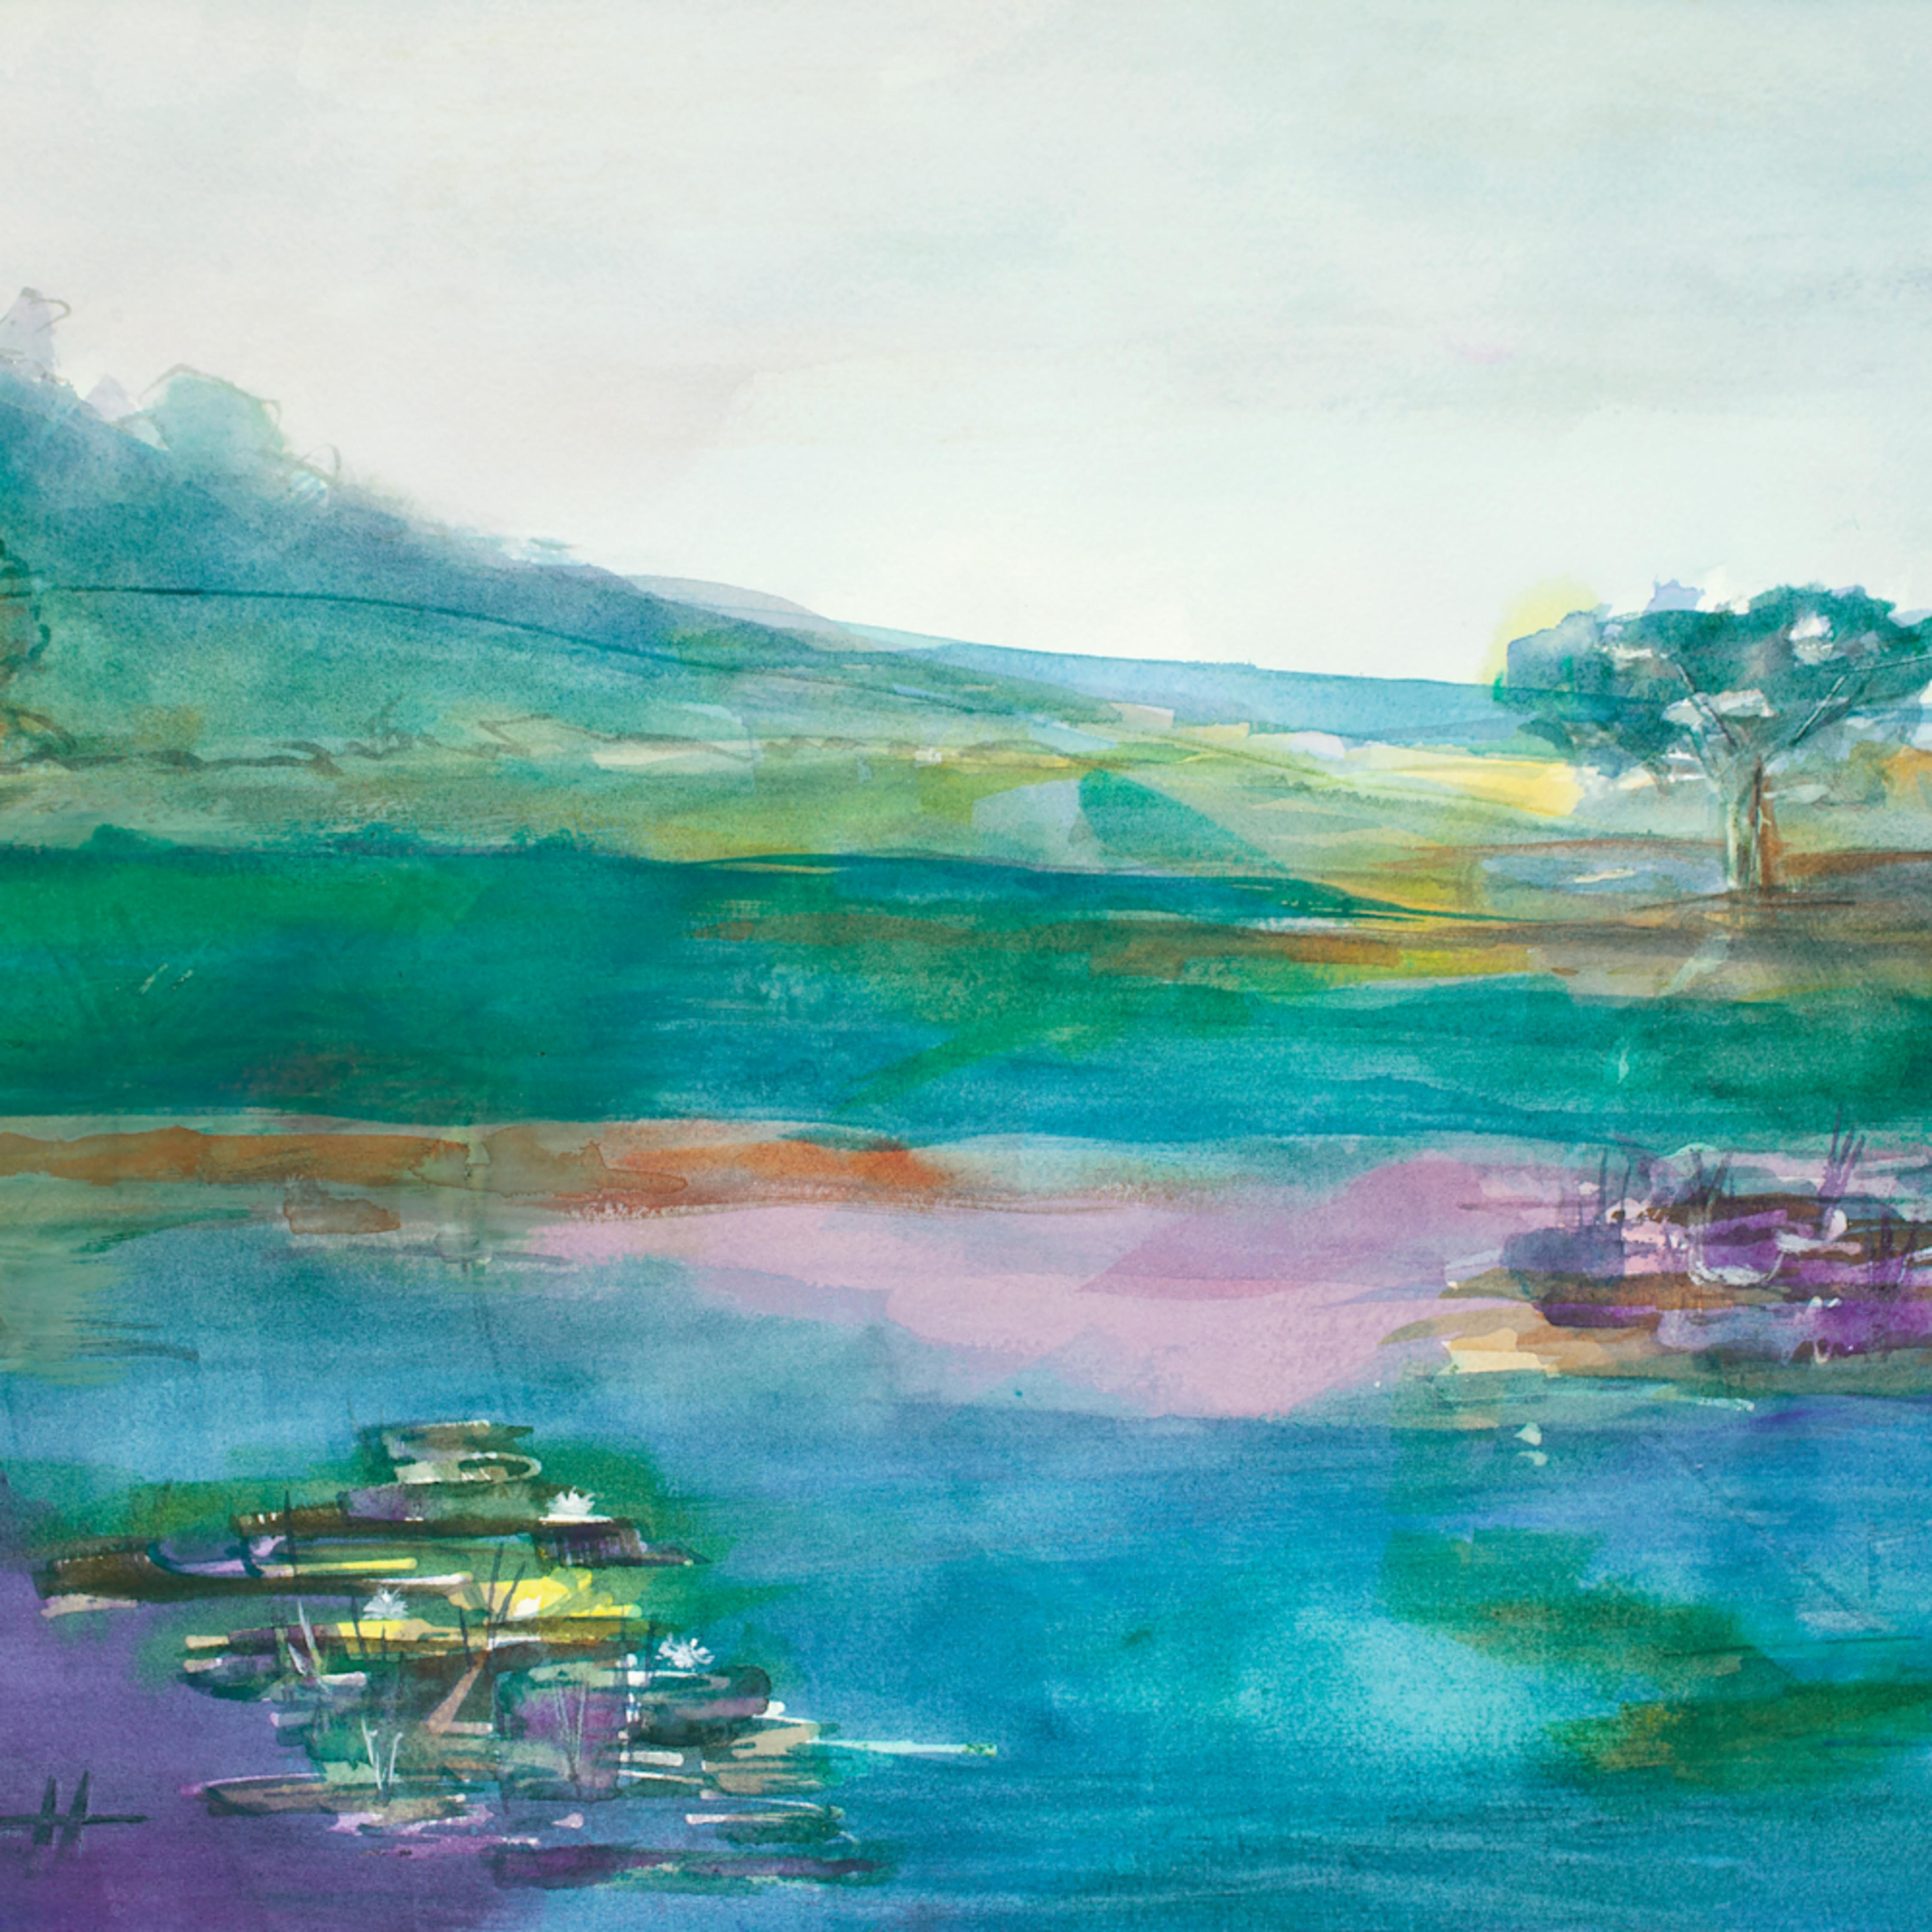 The lagoon xarnjo